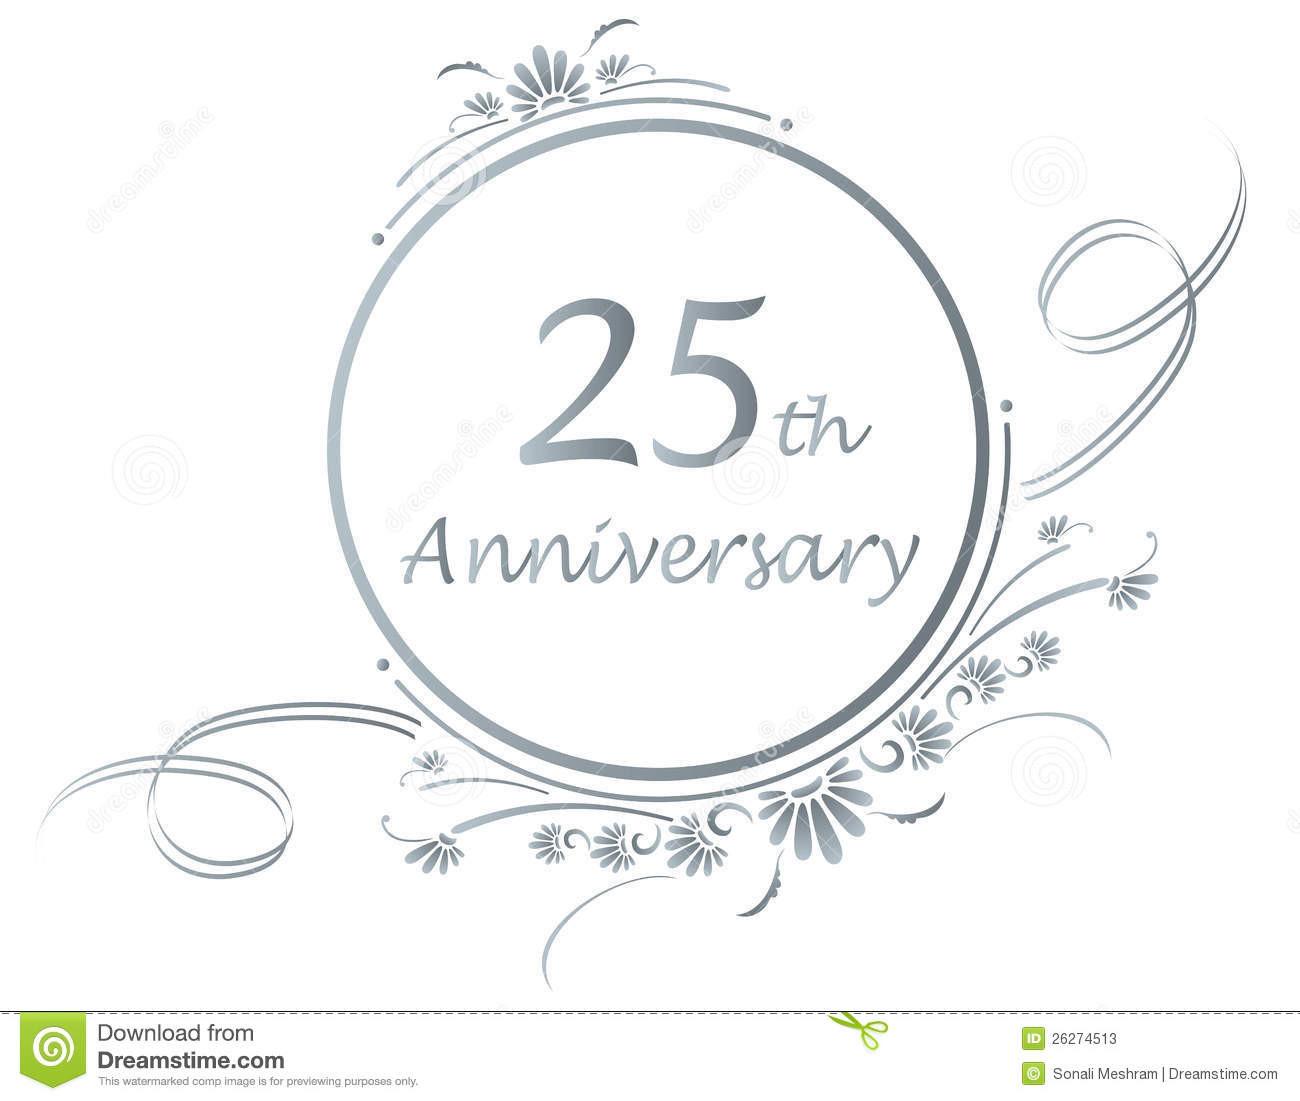 Anniversary clipart aniversary, Anniversary aniversary.